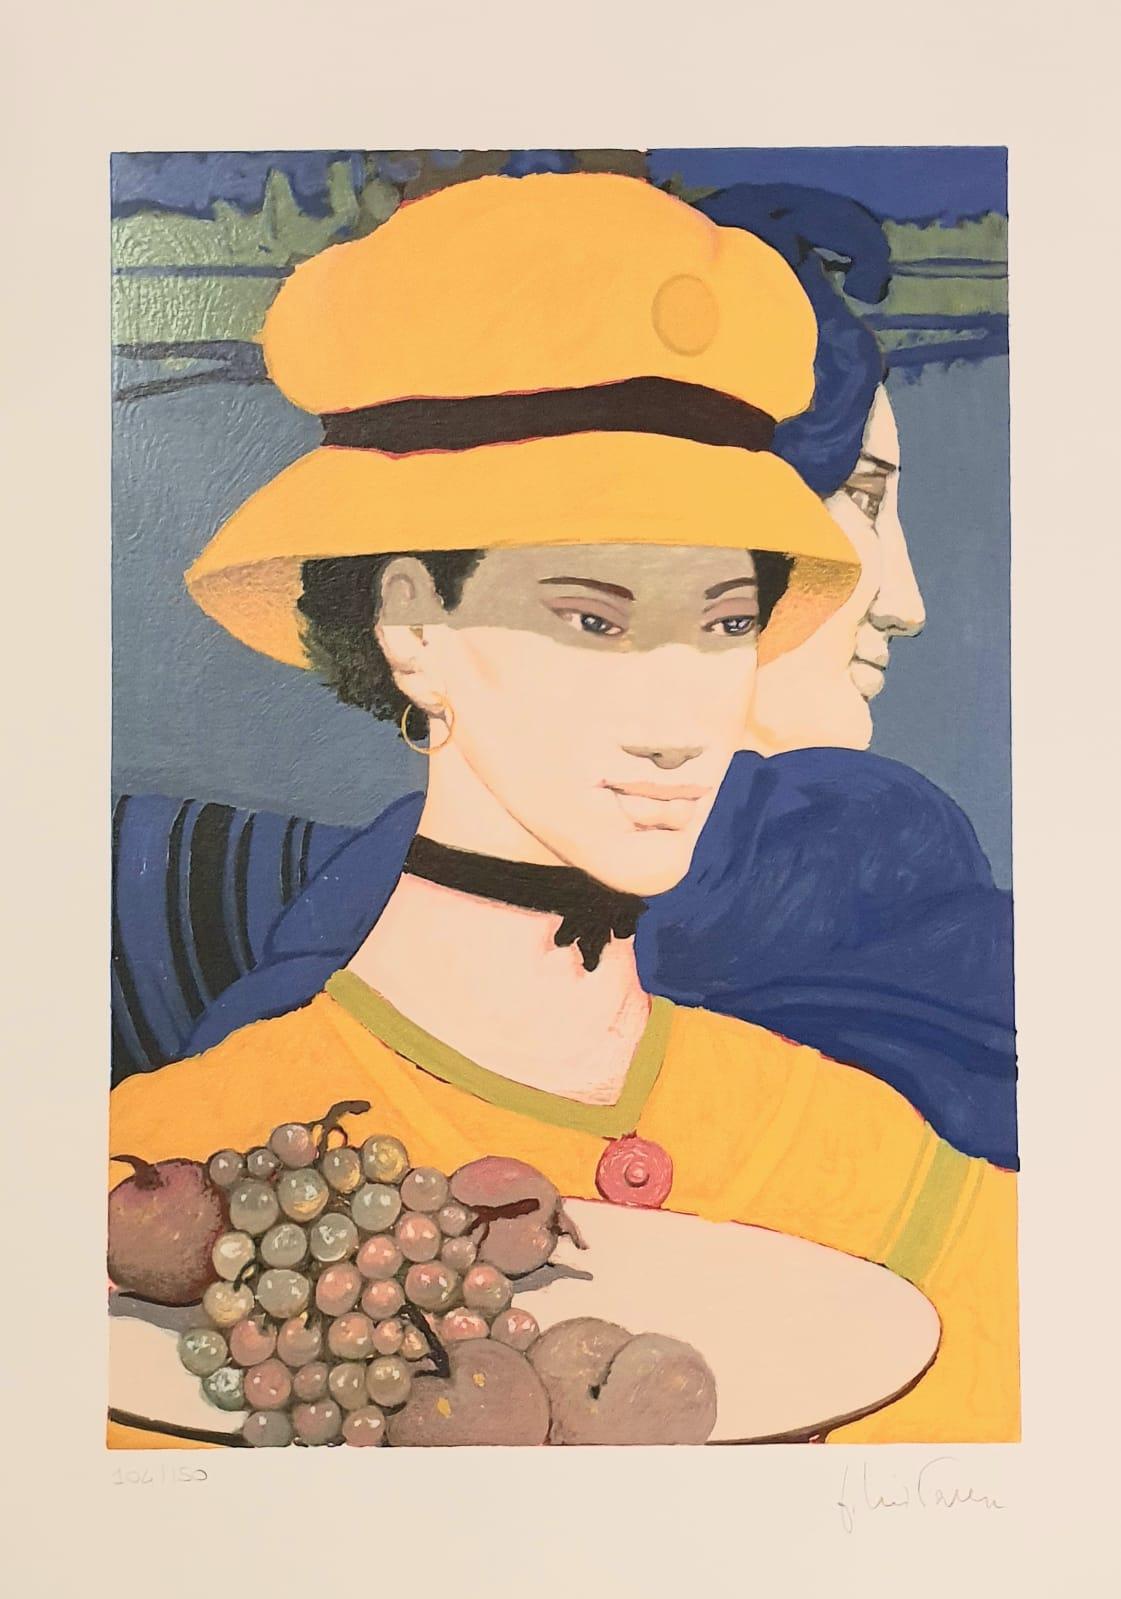 Donne su fondo blu - Women on Blue Background, Serigraphs print on paper, 70*50, 1990, Goffredo Civiterese (Italy)